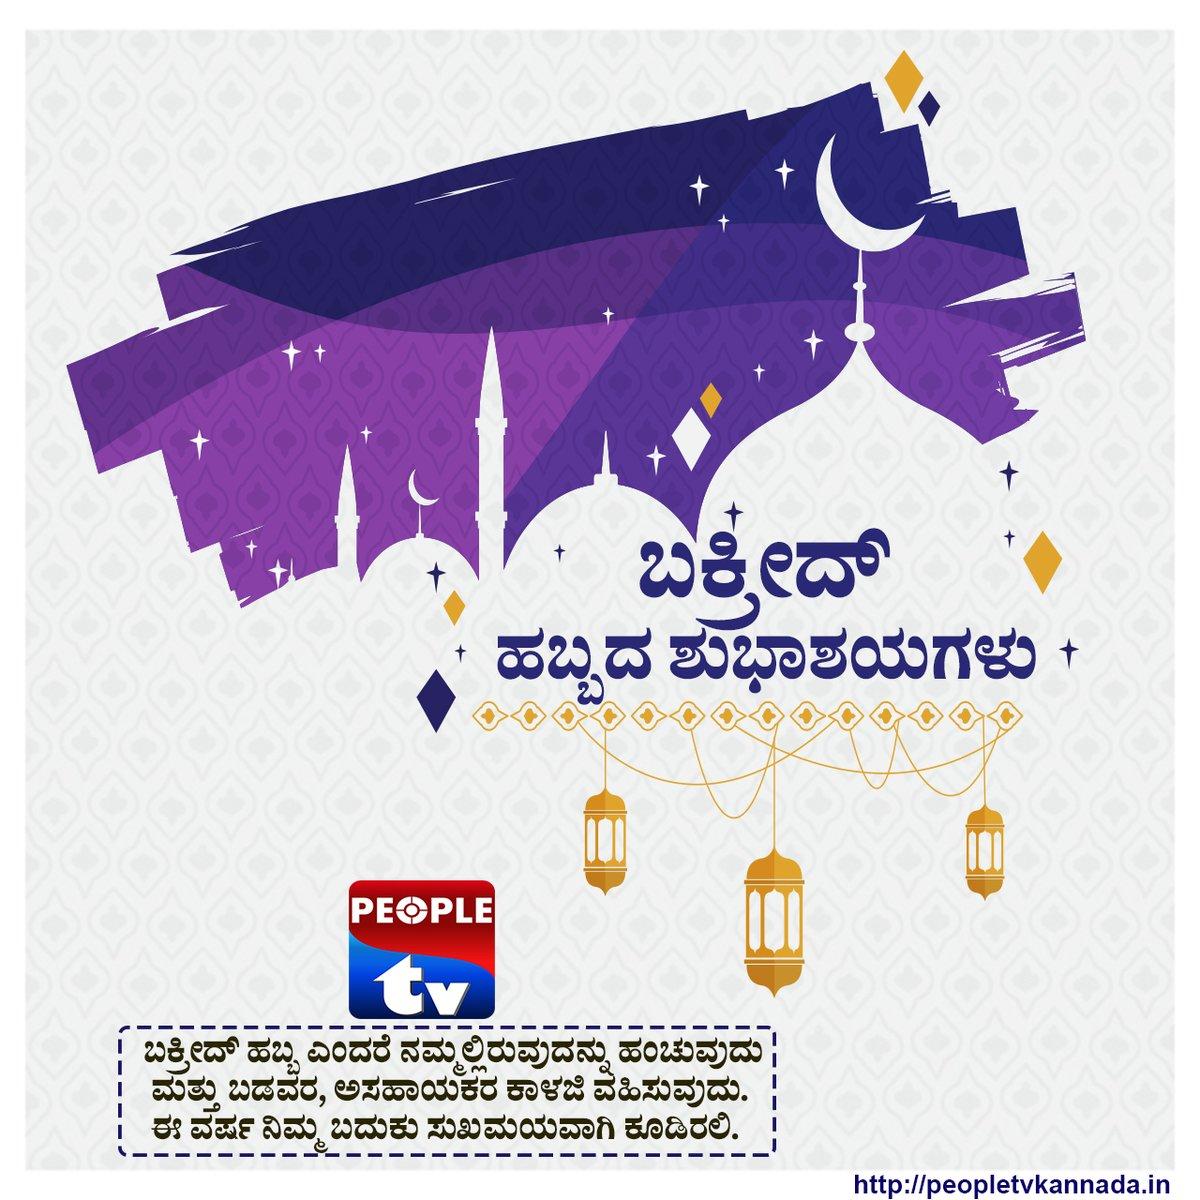 Eid Mubarak! #Karnataka  #PeopletvKannada #peopletvLive #peopletv #KannadaNewsChannel #LatestNews #LatestKannadaNews #Kannada #Newsnightpic.twitter.com/7Q9t4JcT5P